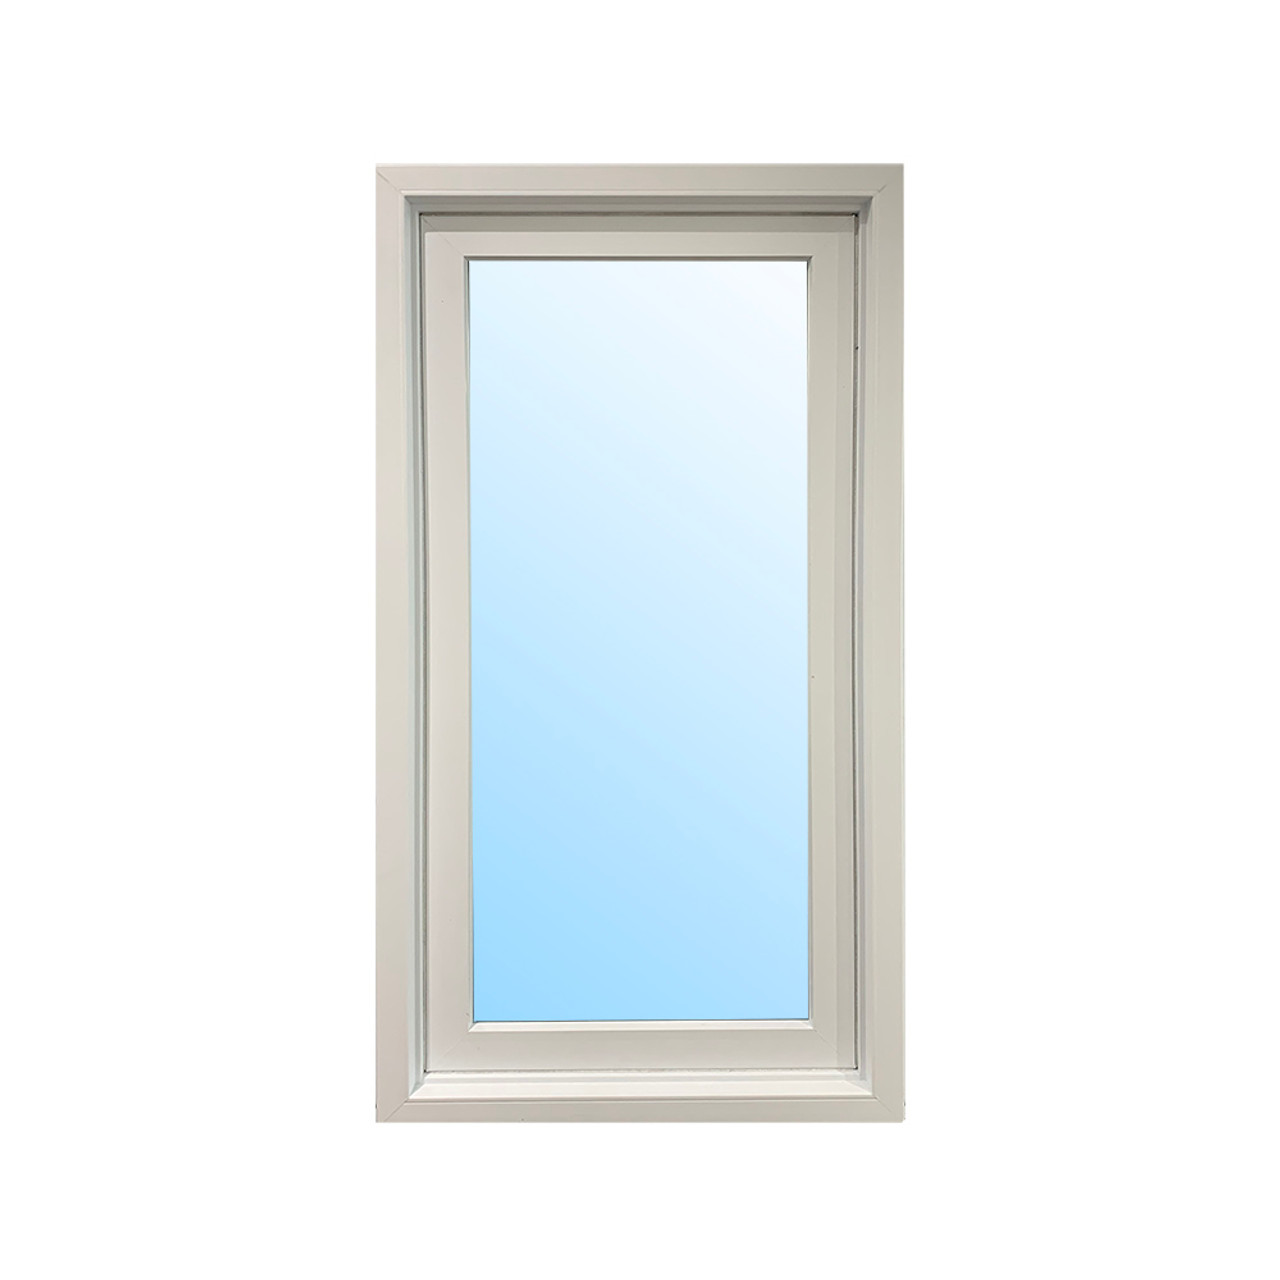 "Castlegard | 24"" x 48"" Casement Window | LEA"